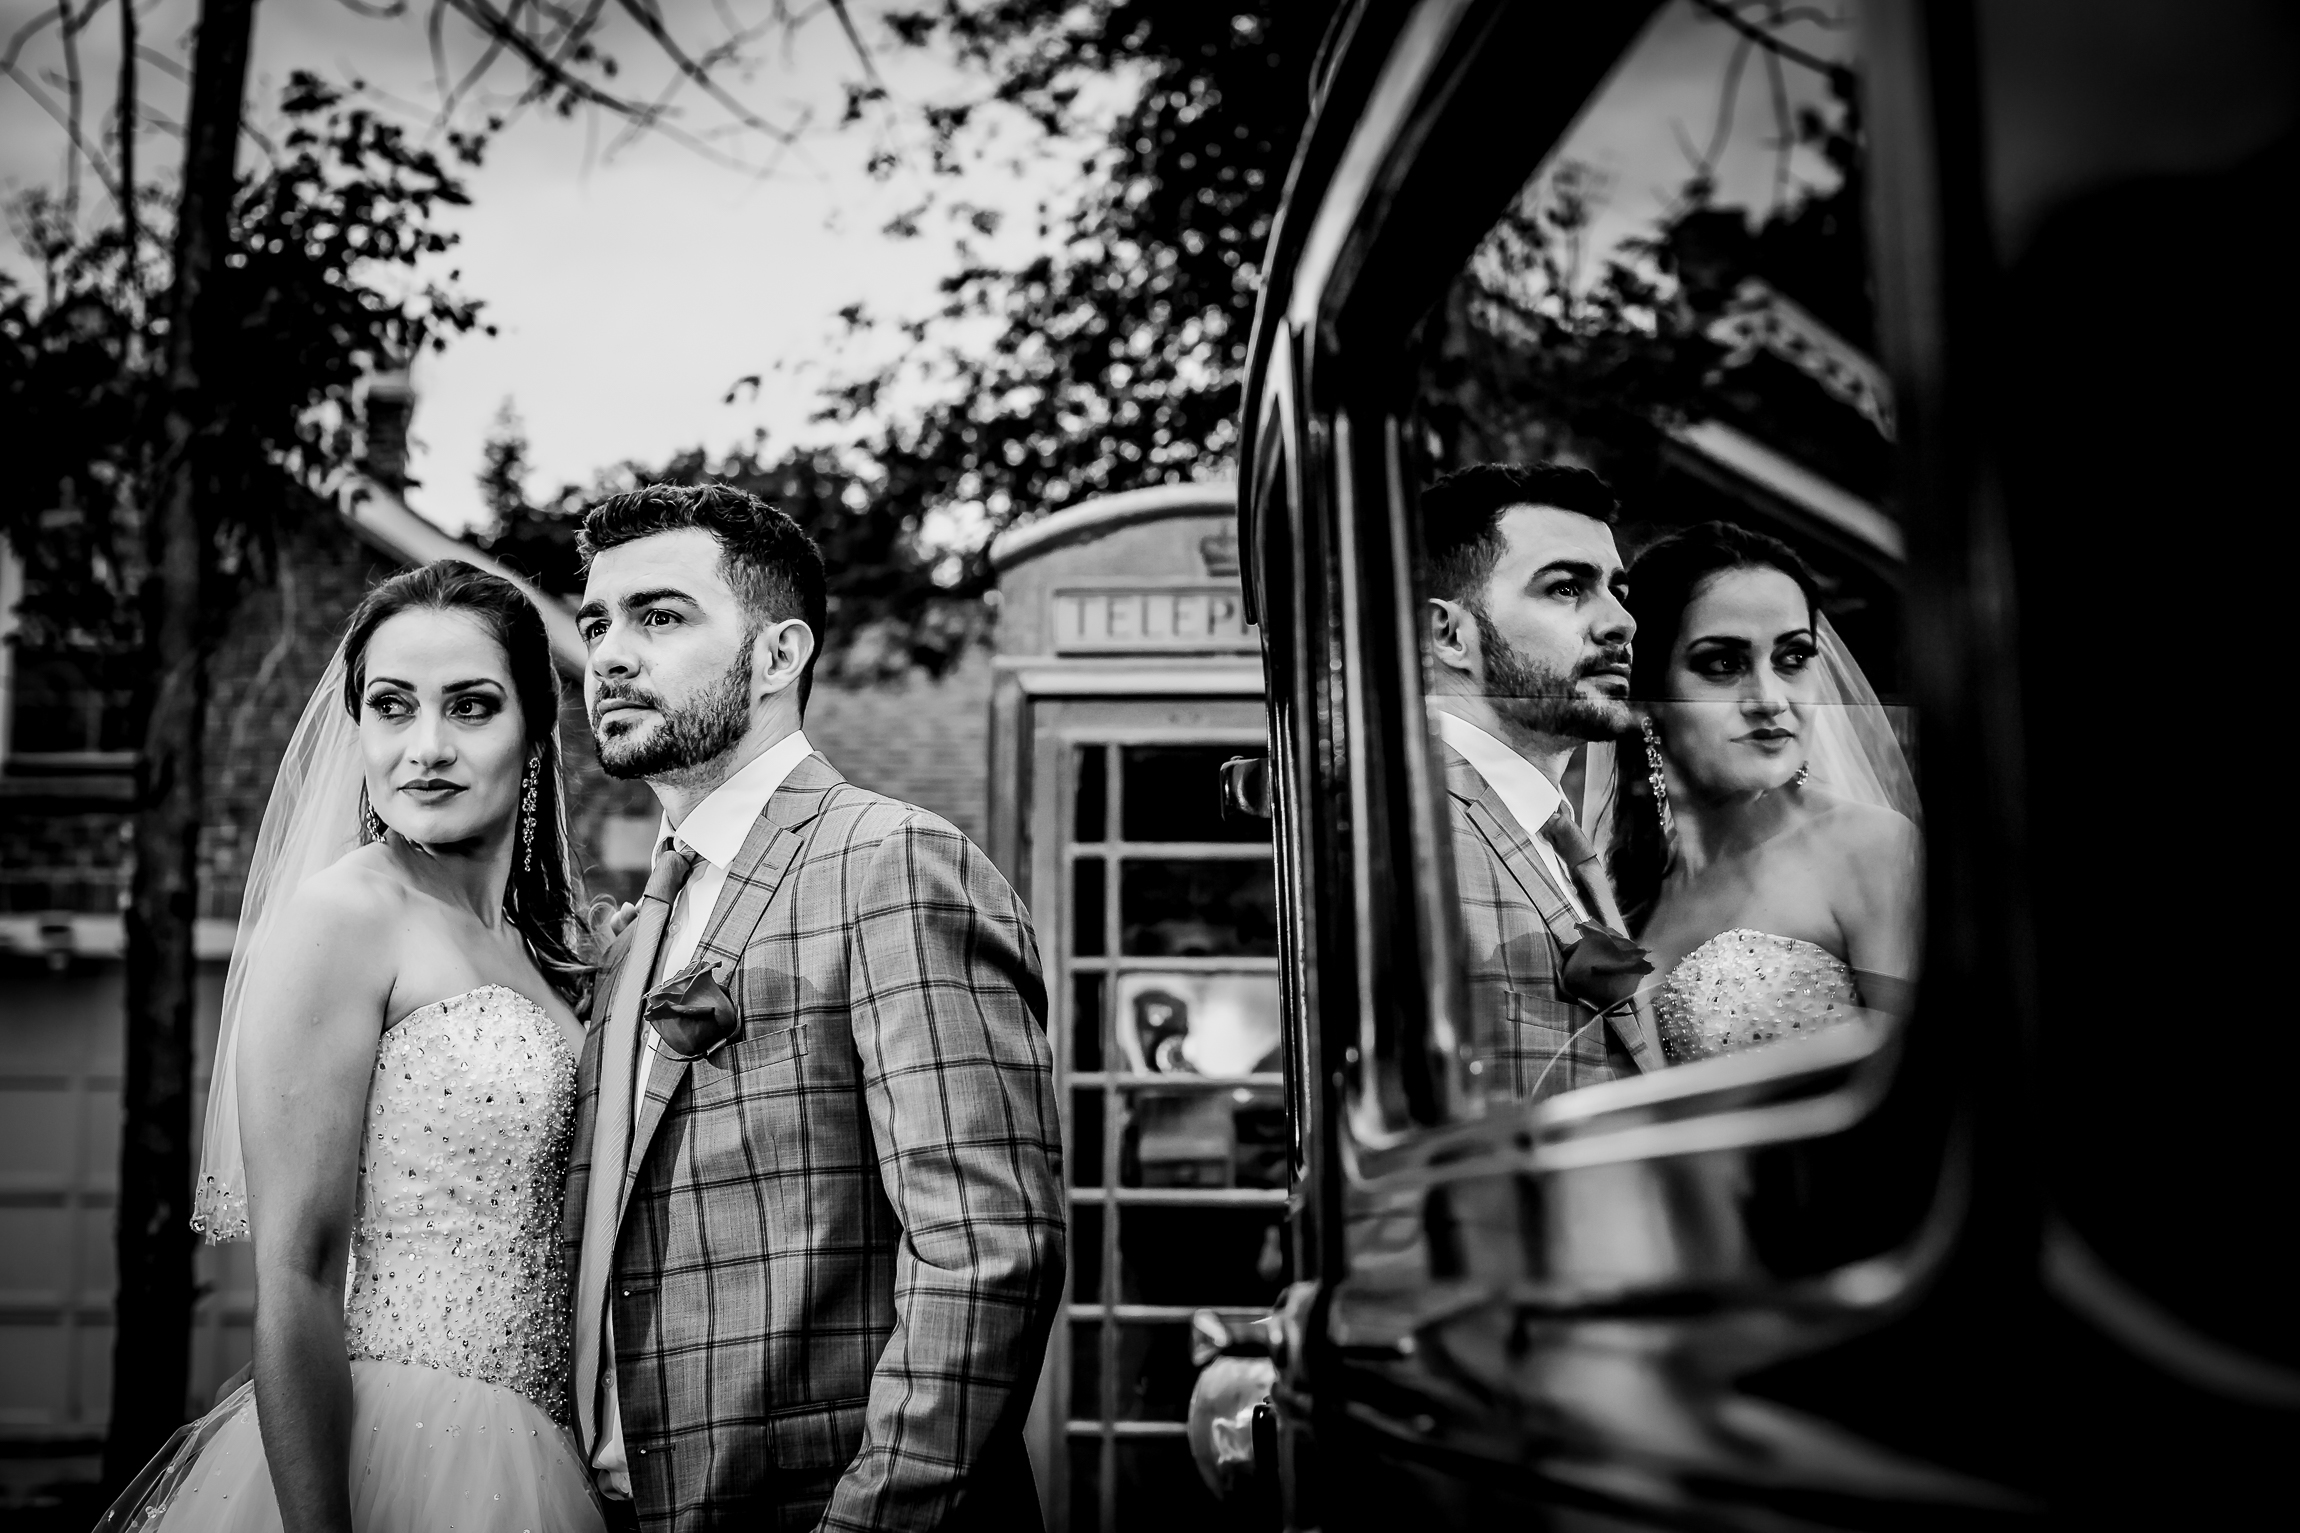 Toronto-wedding-Photograper-104.jpg